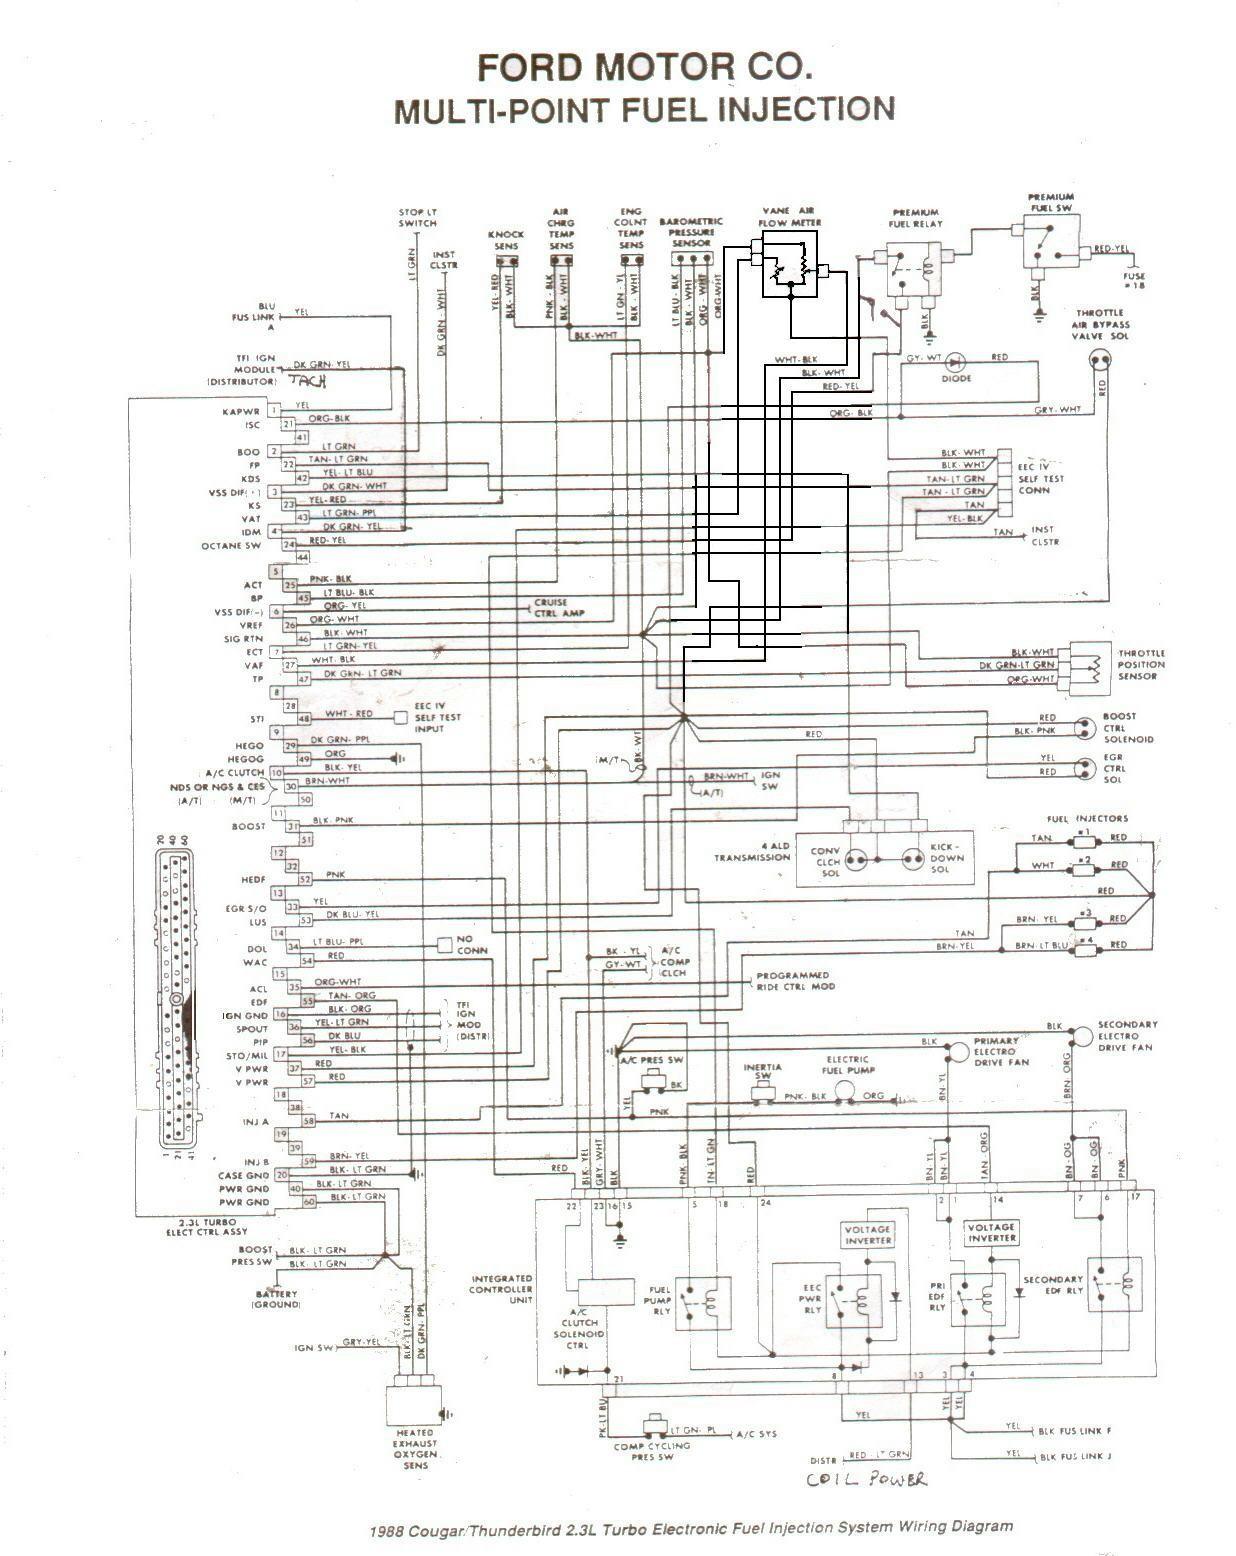 Ford Ranger Wiring Harness Diagram 1985 ford Ranger Wiring Diagram Lorestanfo Of Ford Ranger Wiring Harness Diagram